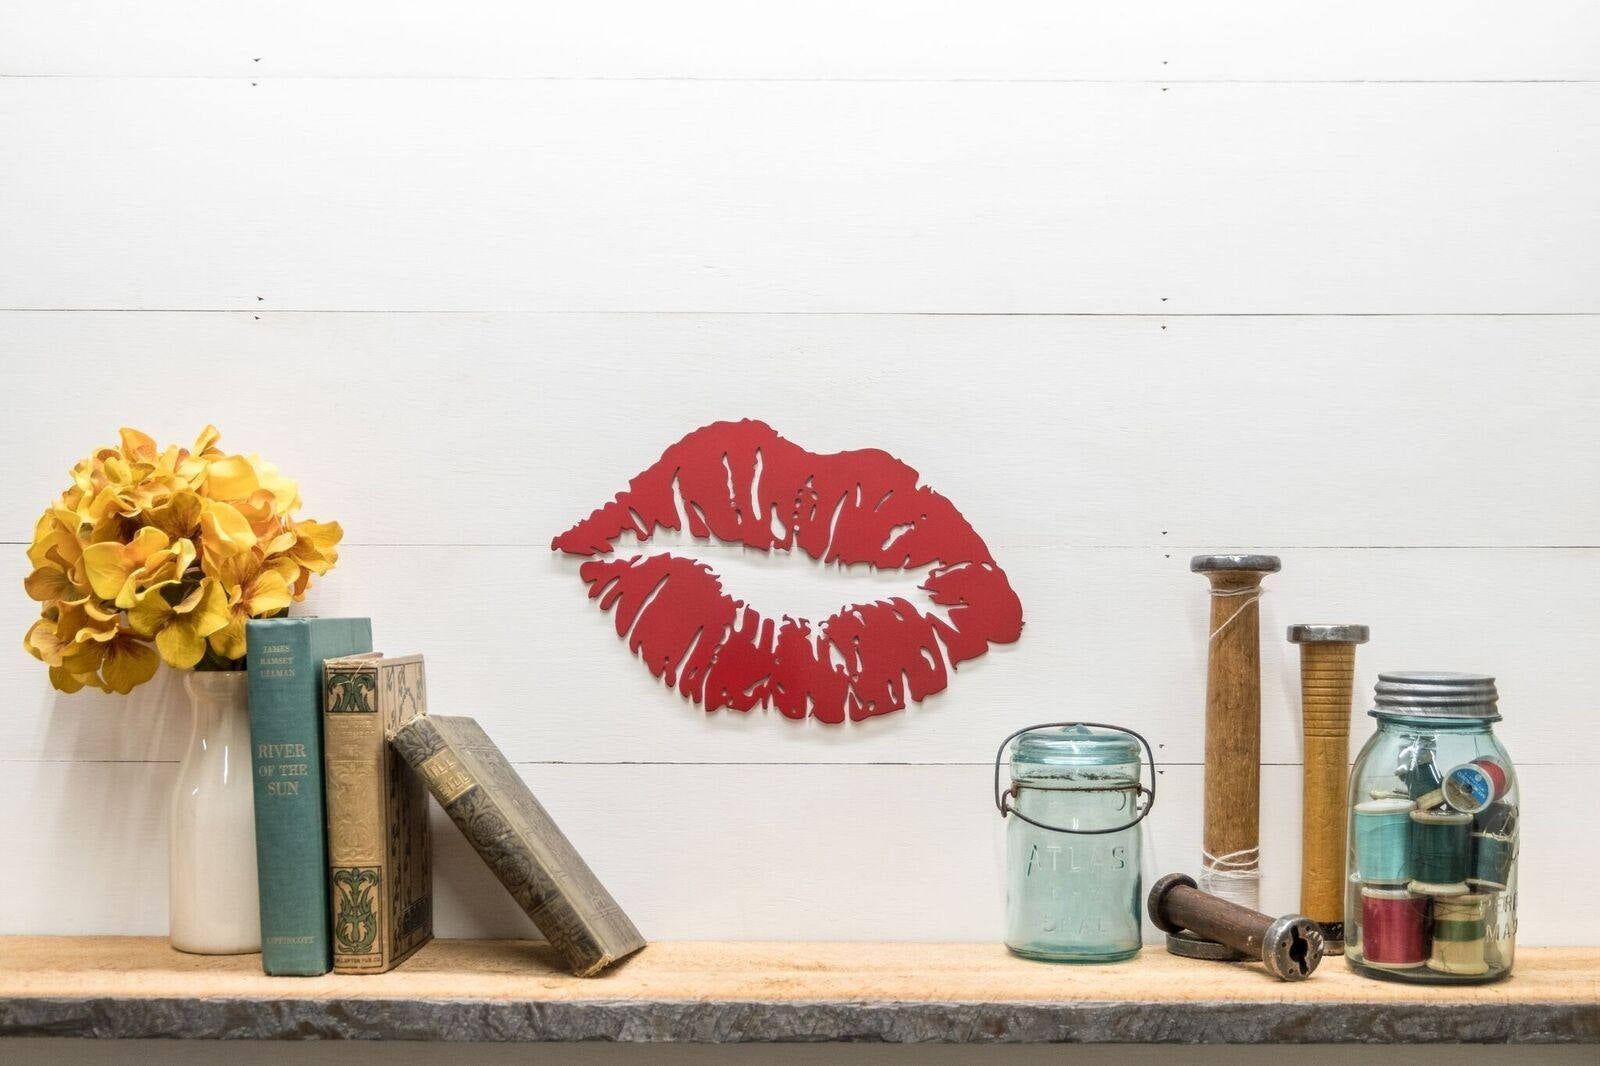 Red Metal Kiss Lips Wall Decor #RedKissLips #WeddingGiftIdeas #RedMetalKissLips #LoveDecor #BoutiqueDecor #RedLipstick #WallHangingDecor #LipstickMark #GirlNurseryDecor #VanityDecor